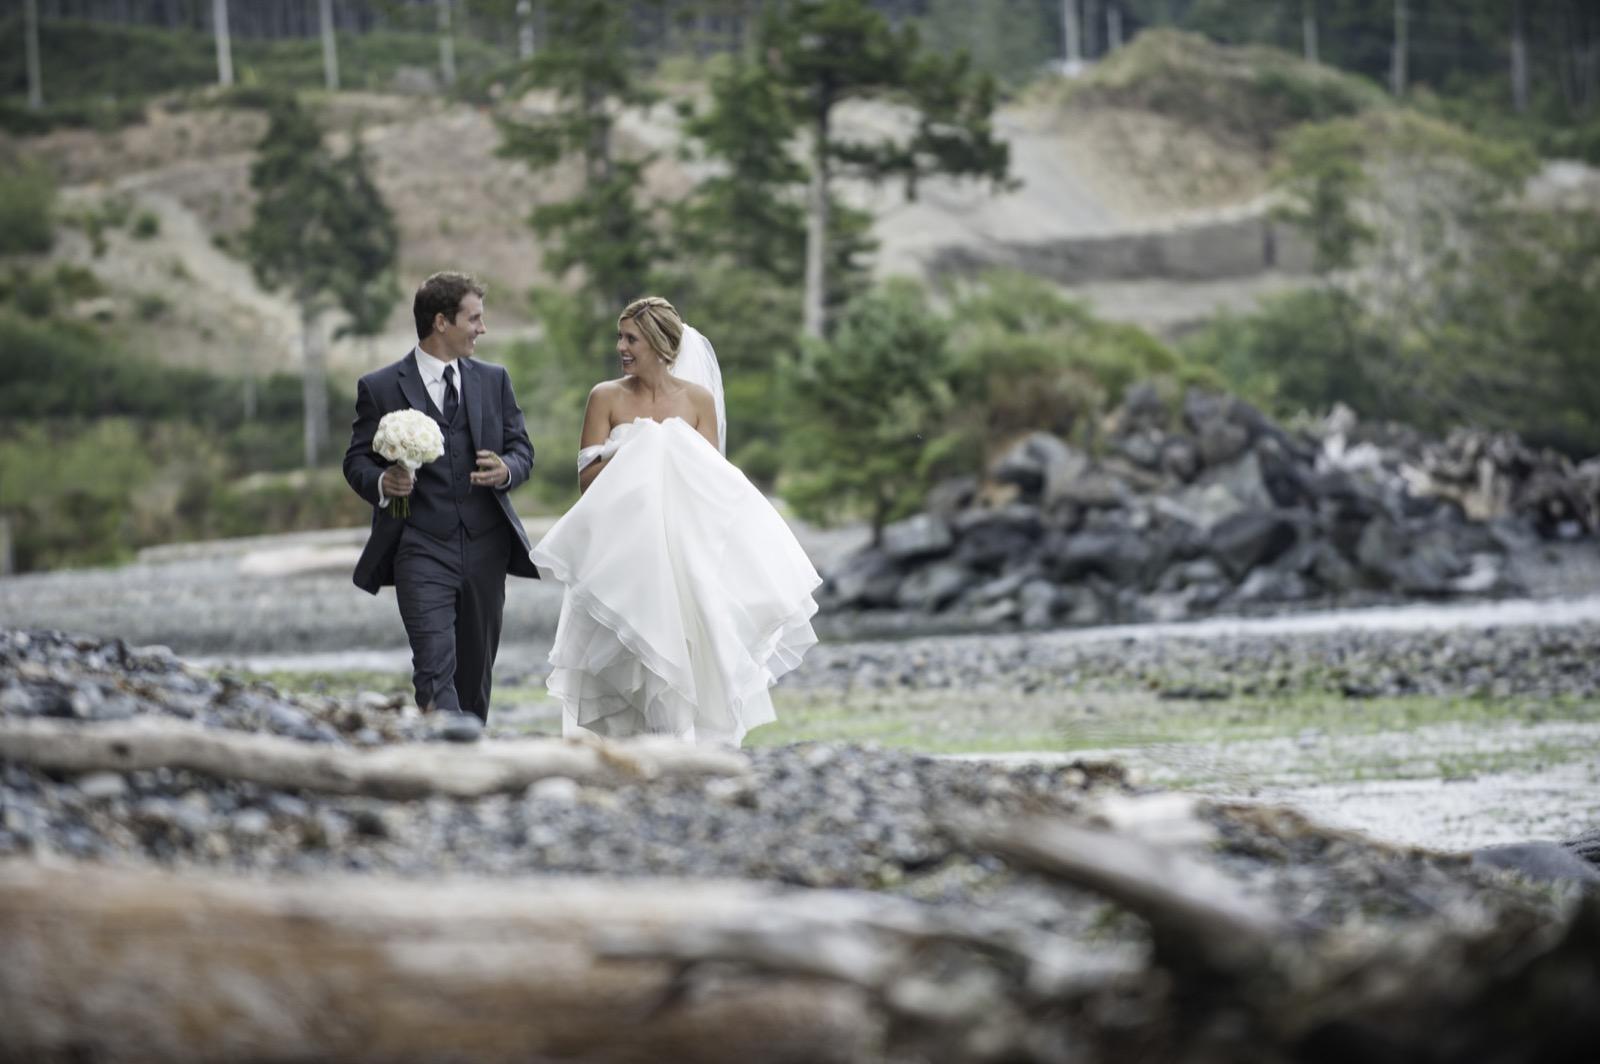 sooke-wedding-photographers-craidelonna-oceanedge-lodge-wedding-78.jpg